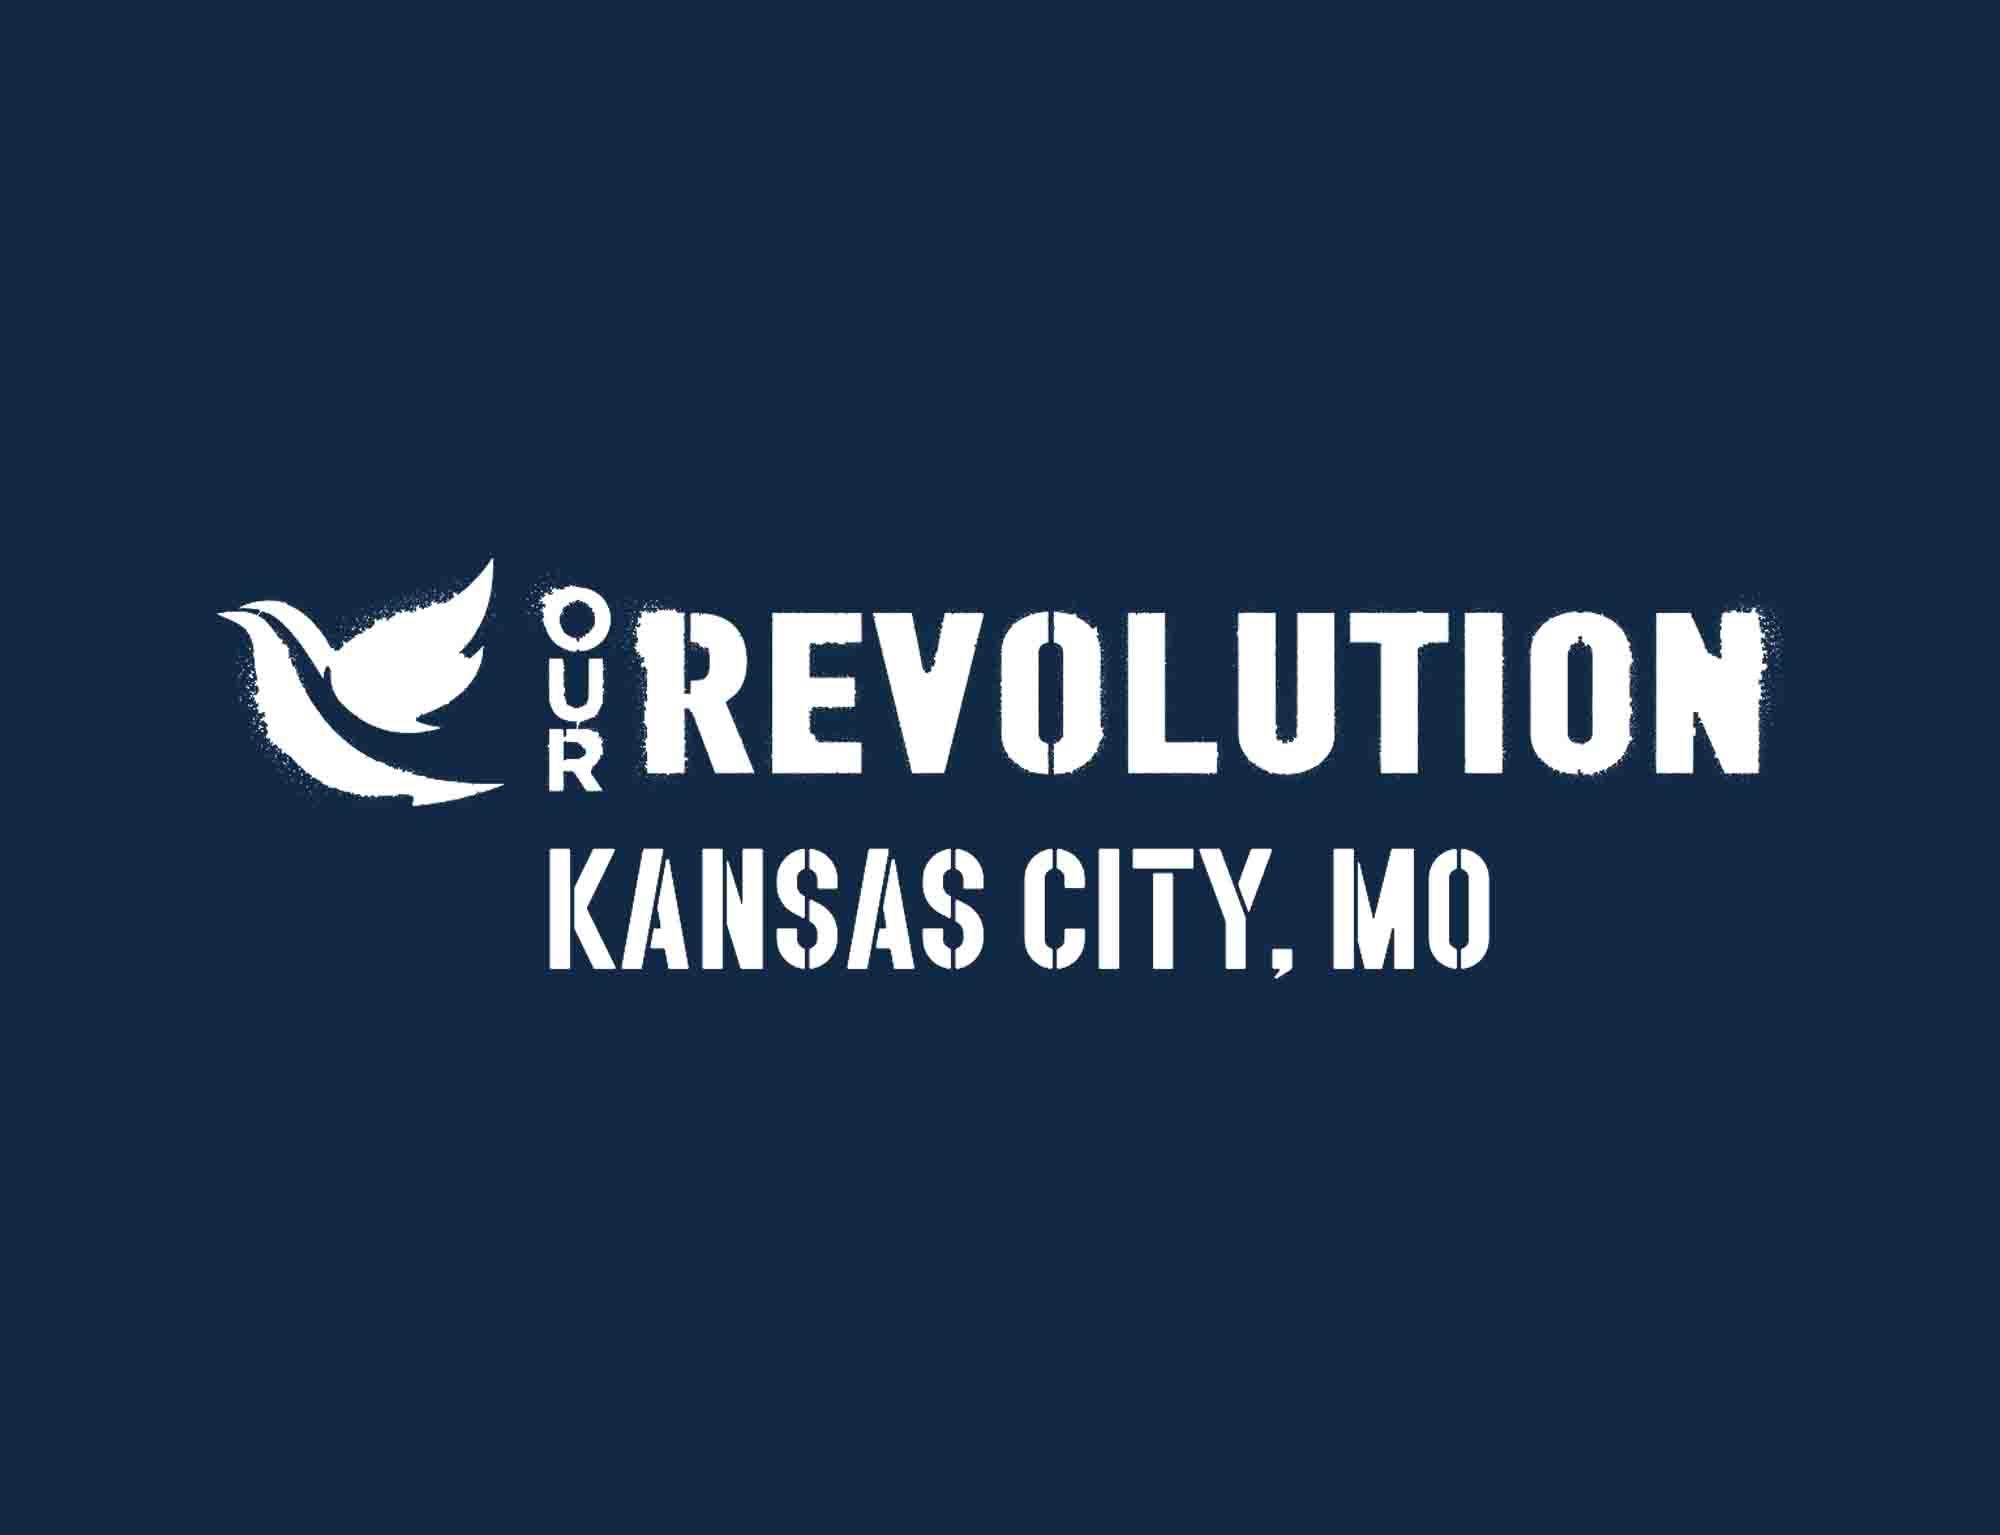 Our Revolution KC